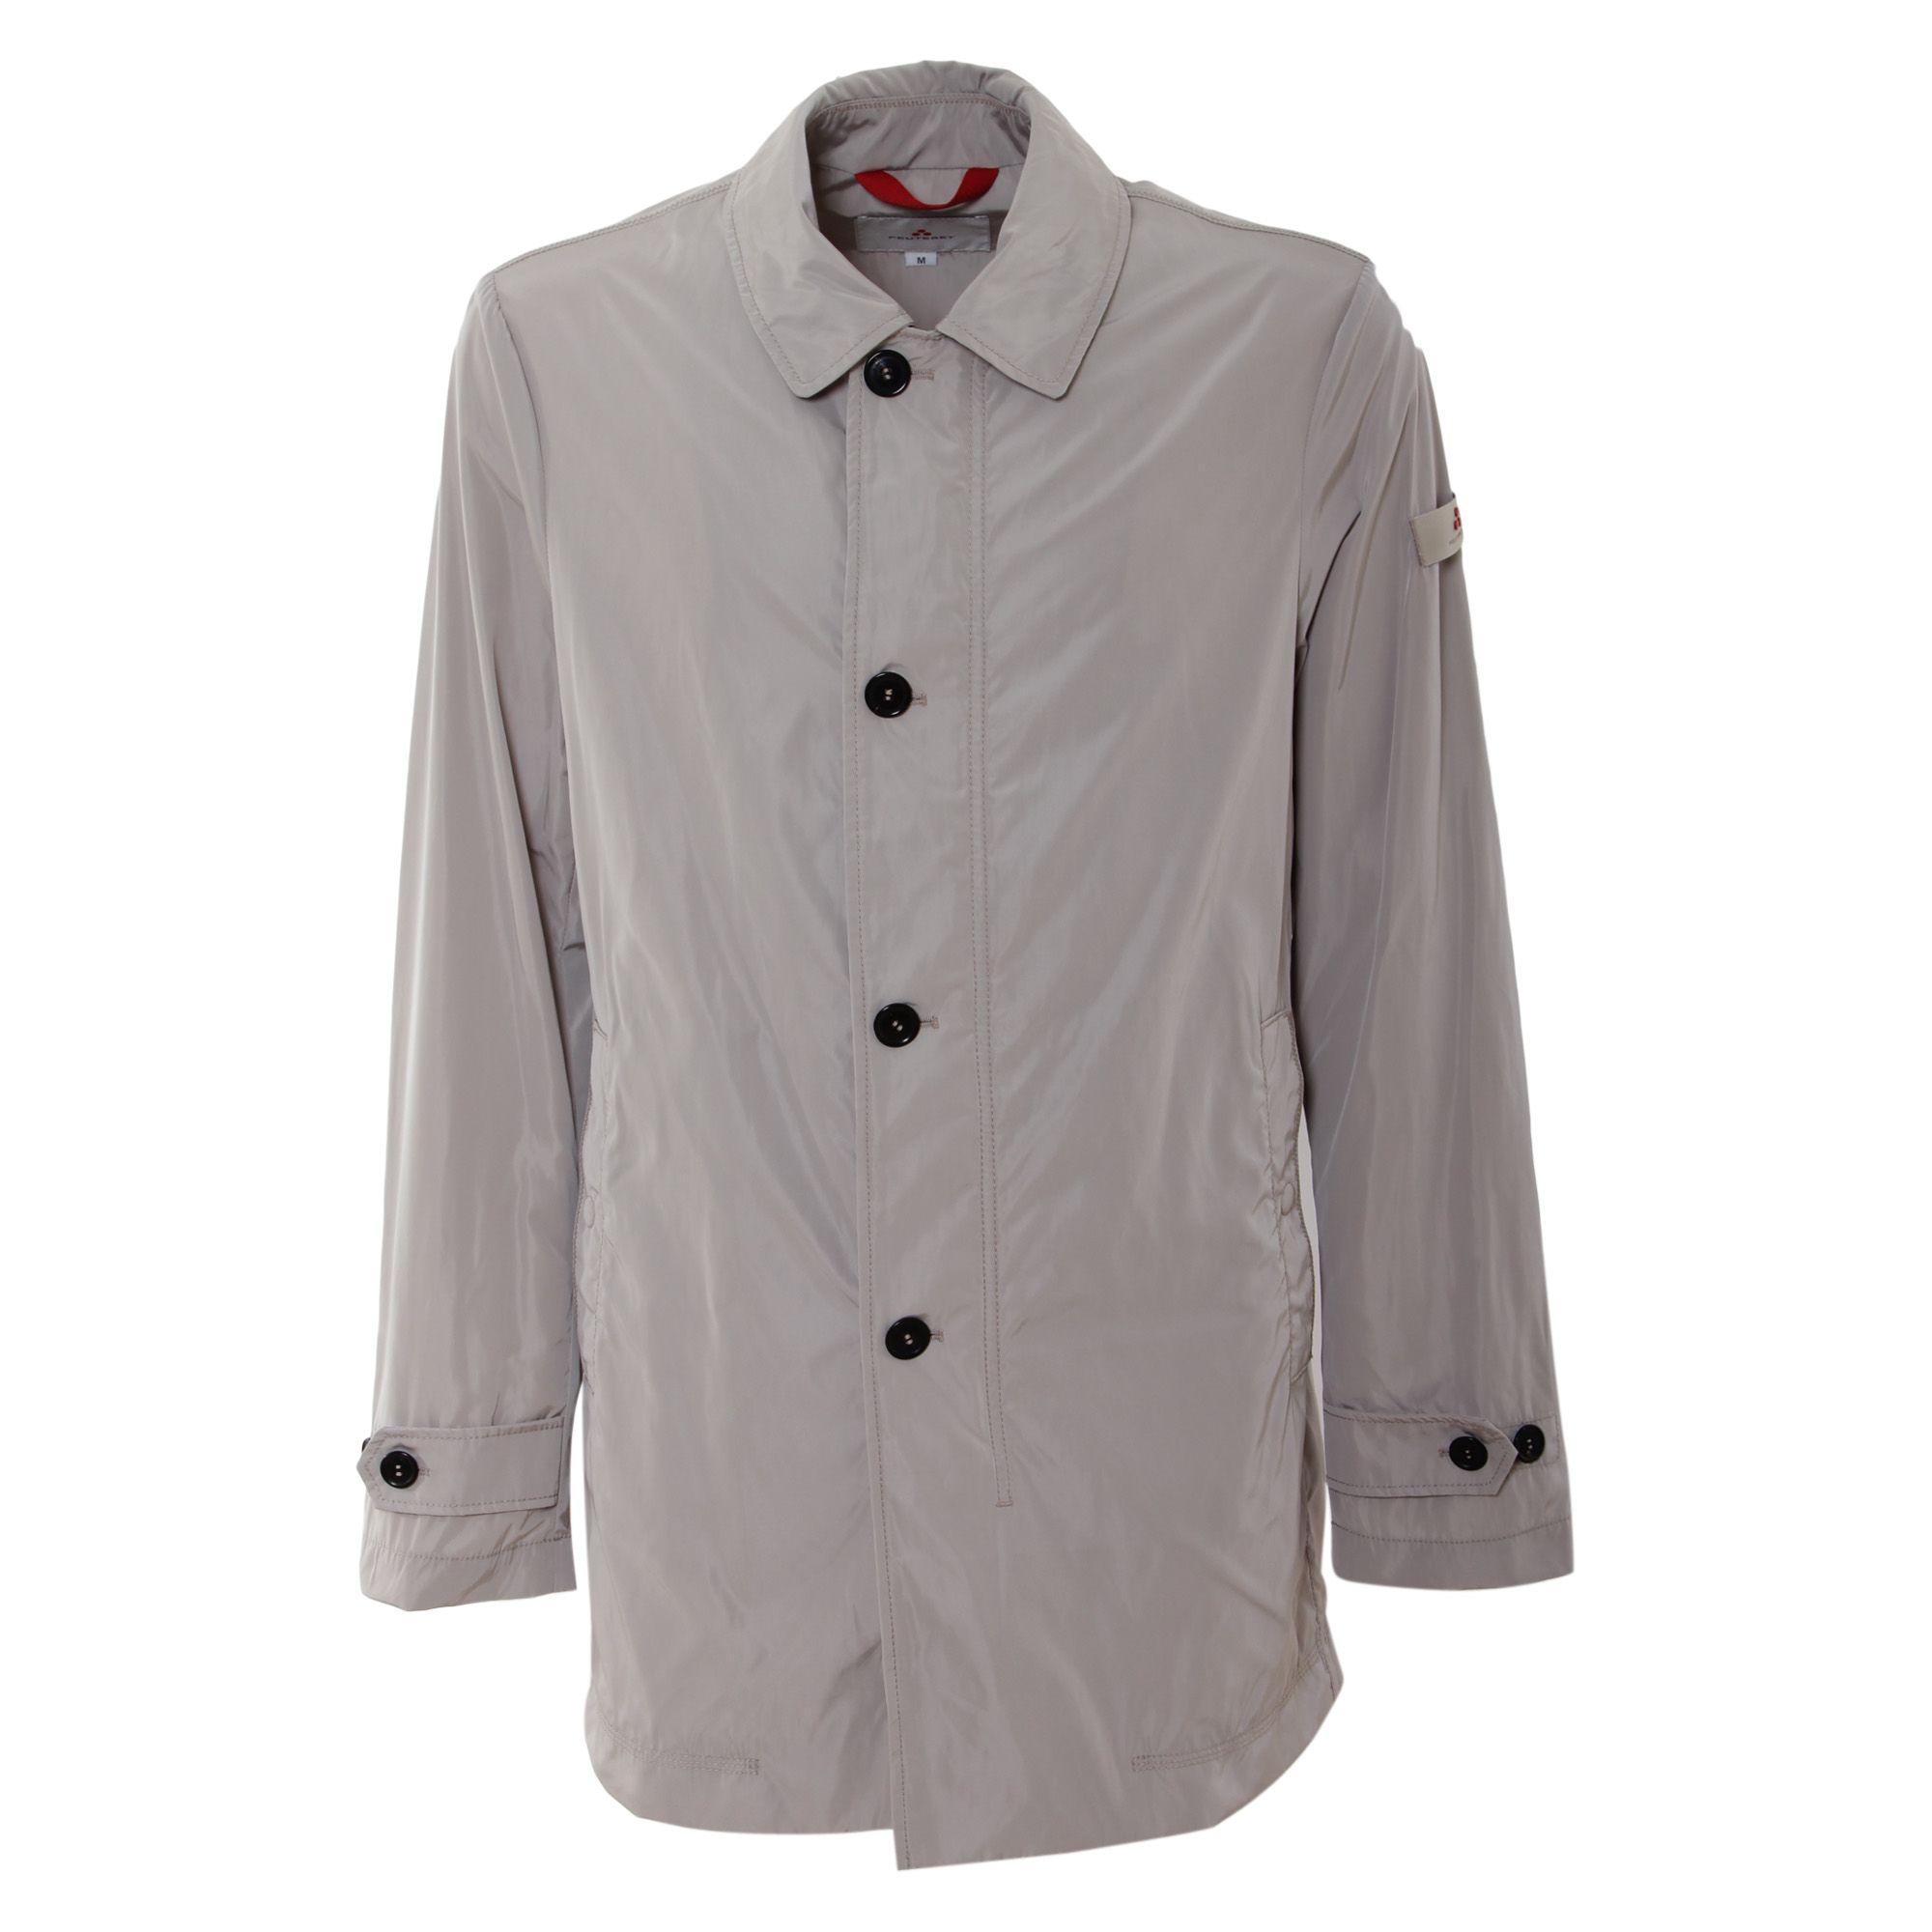 Peuterey Cholla Jacket